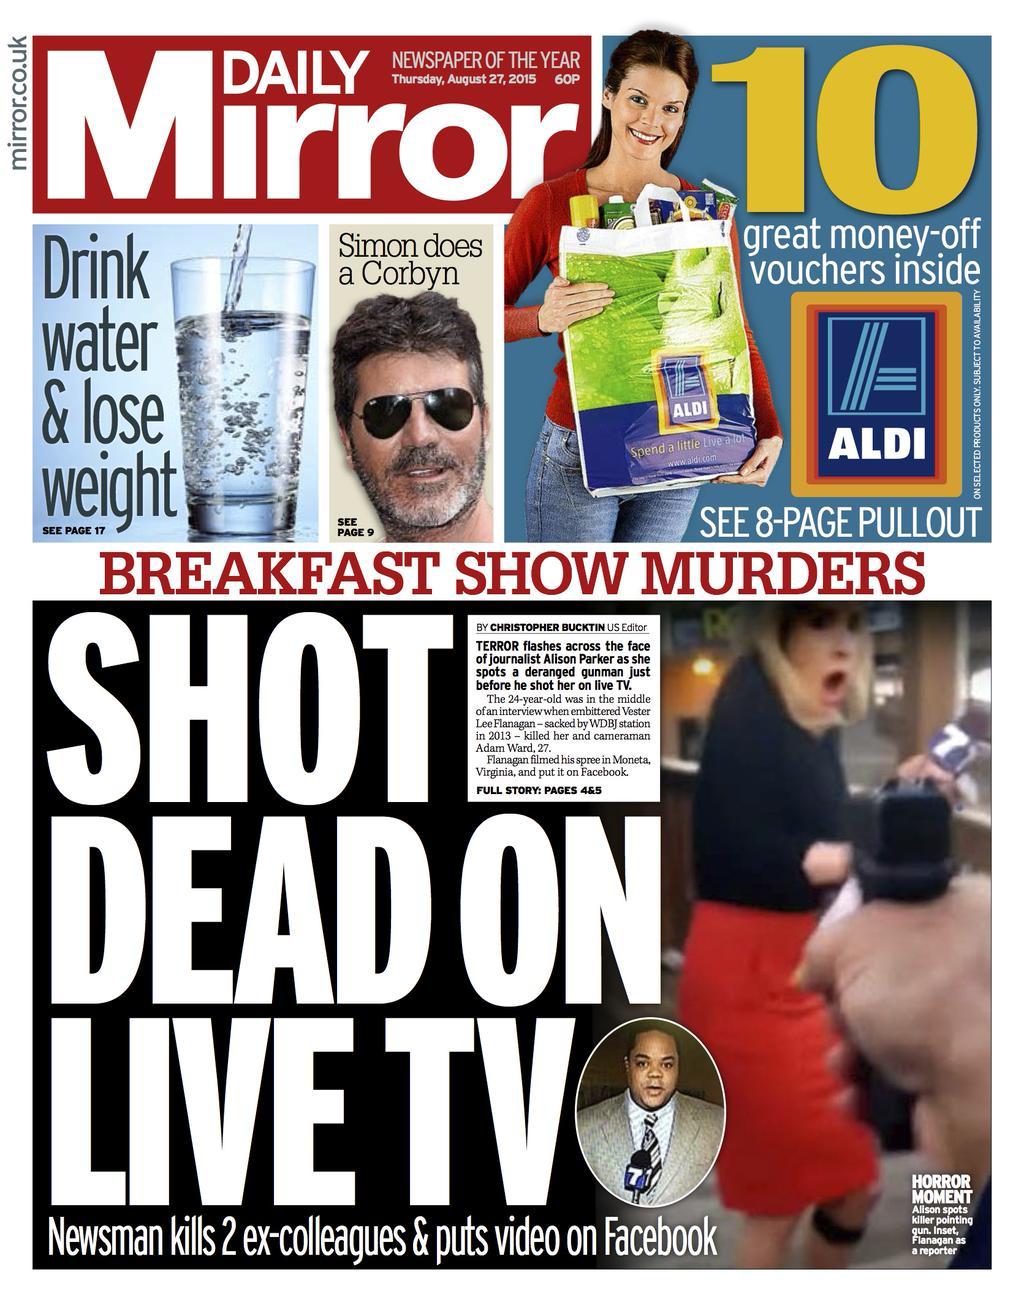 08 - Daily Mirror -- Bad